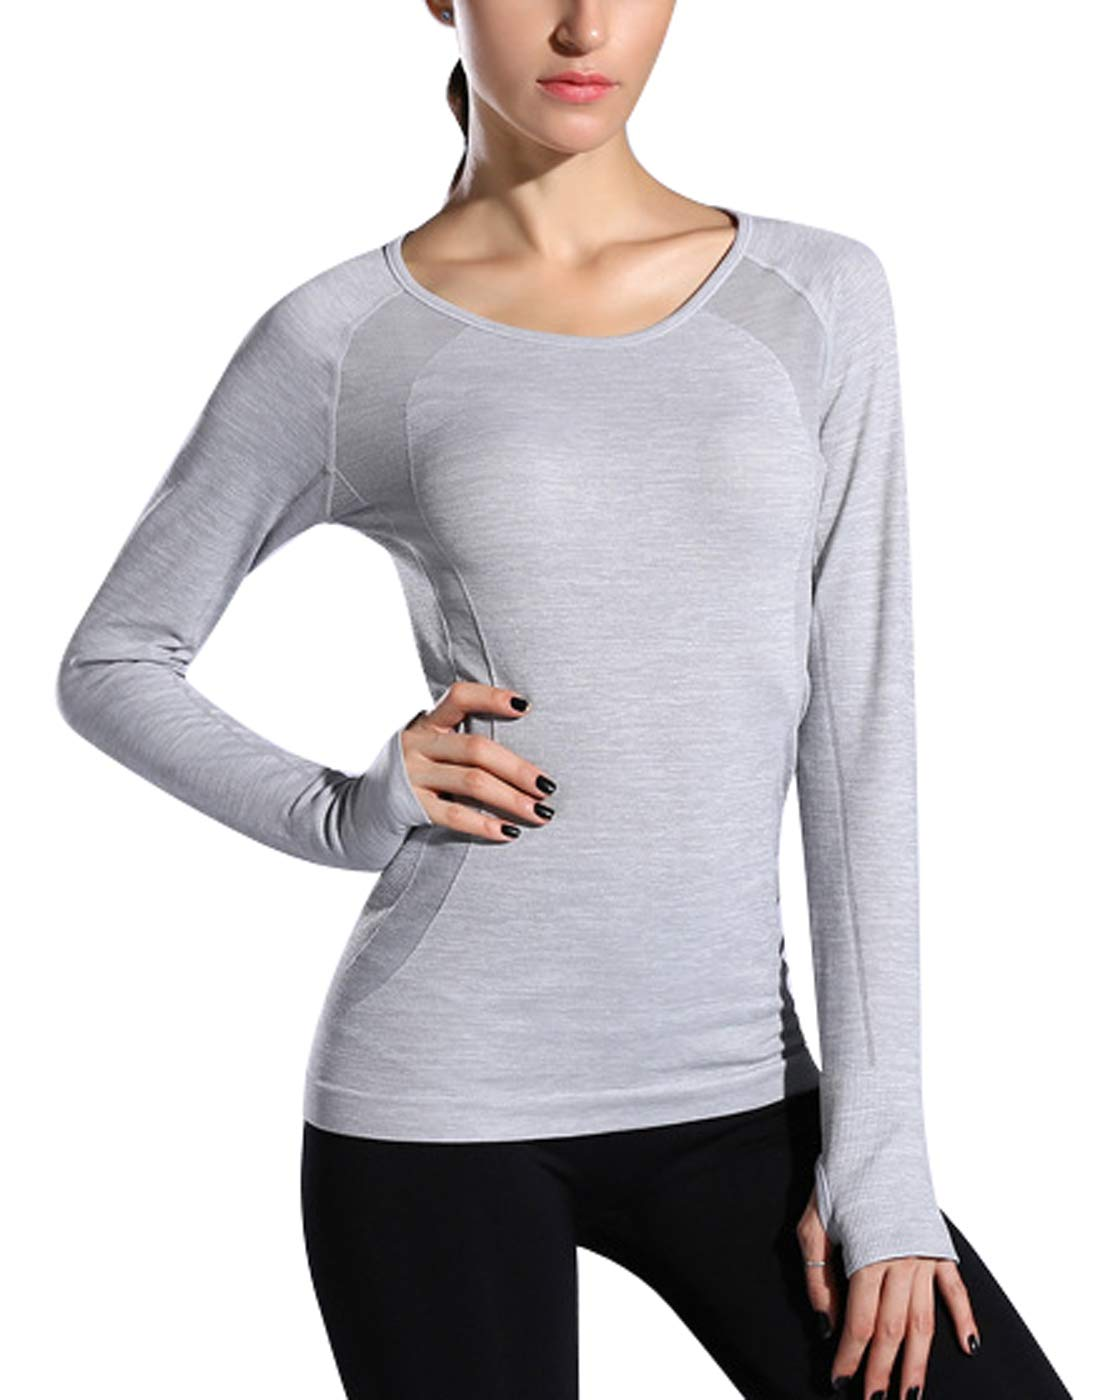 AEROBIC Women Sport Gym Yoga Long Sleeve Shirt Slim Fit Performance Running Tops